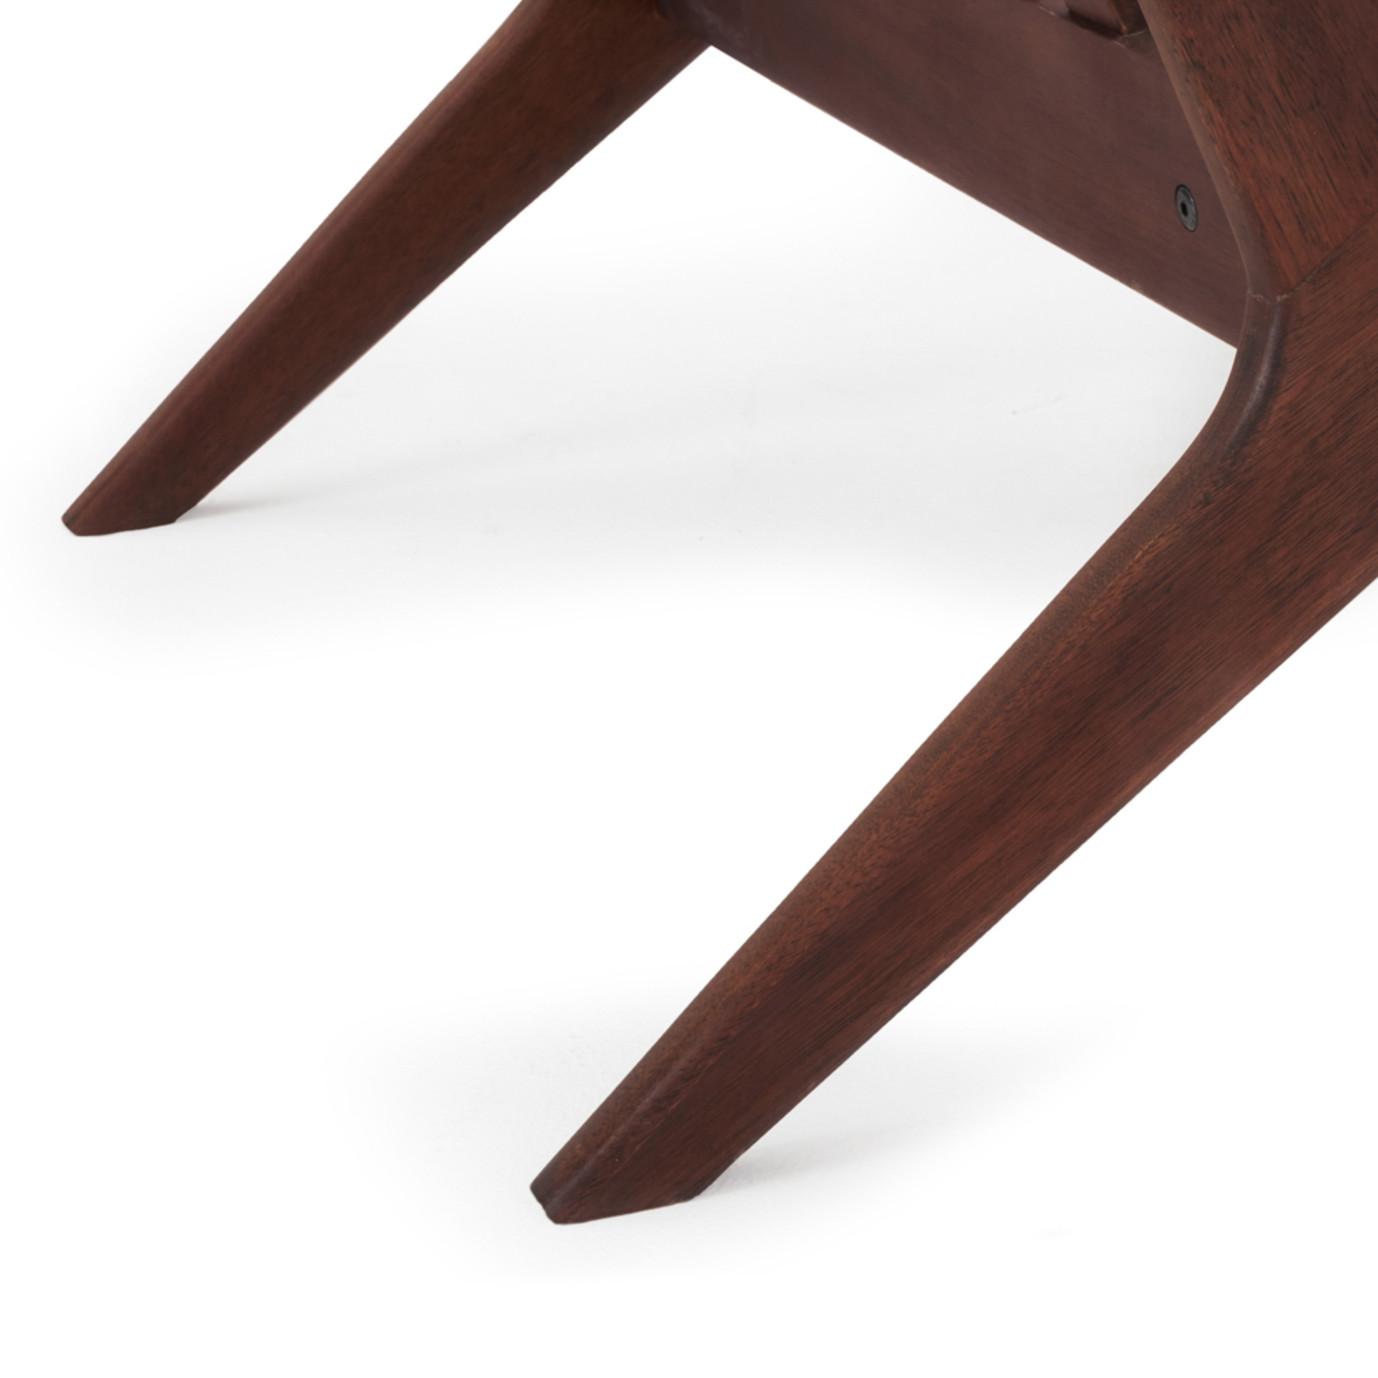 Vaughn Club Chairs - Charcoal Gray